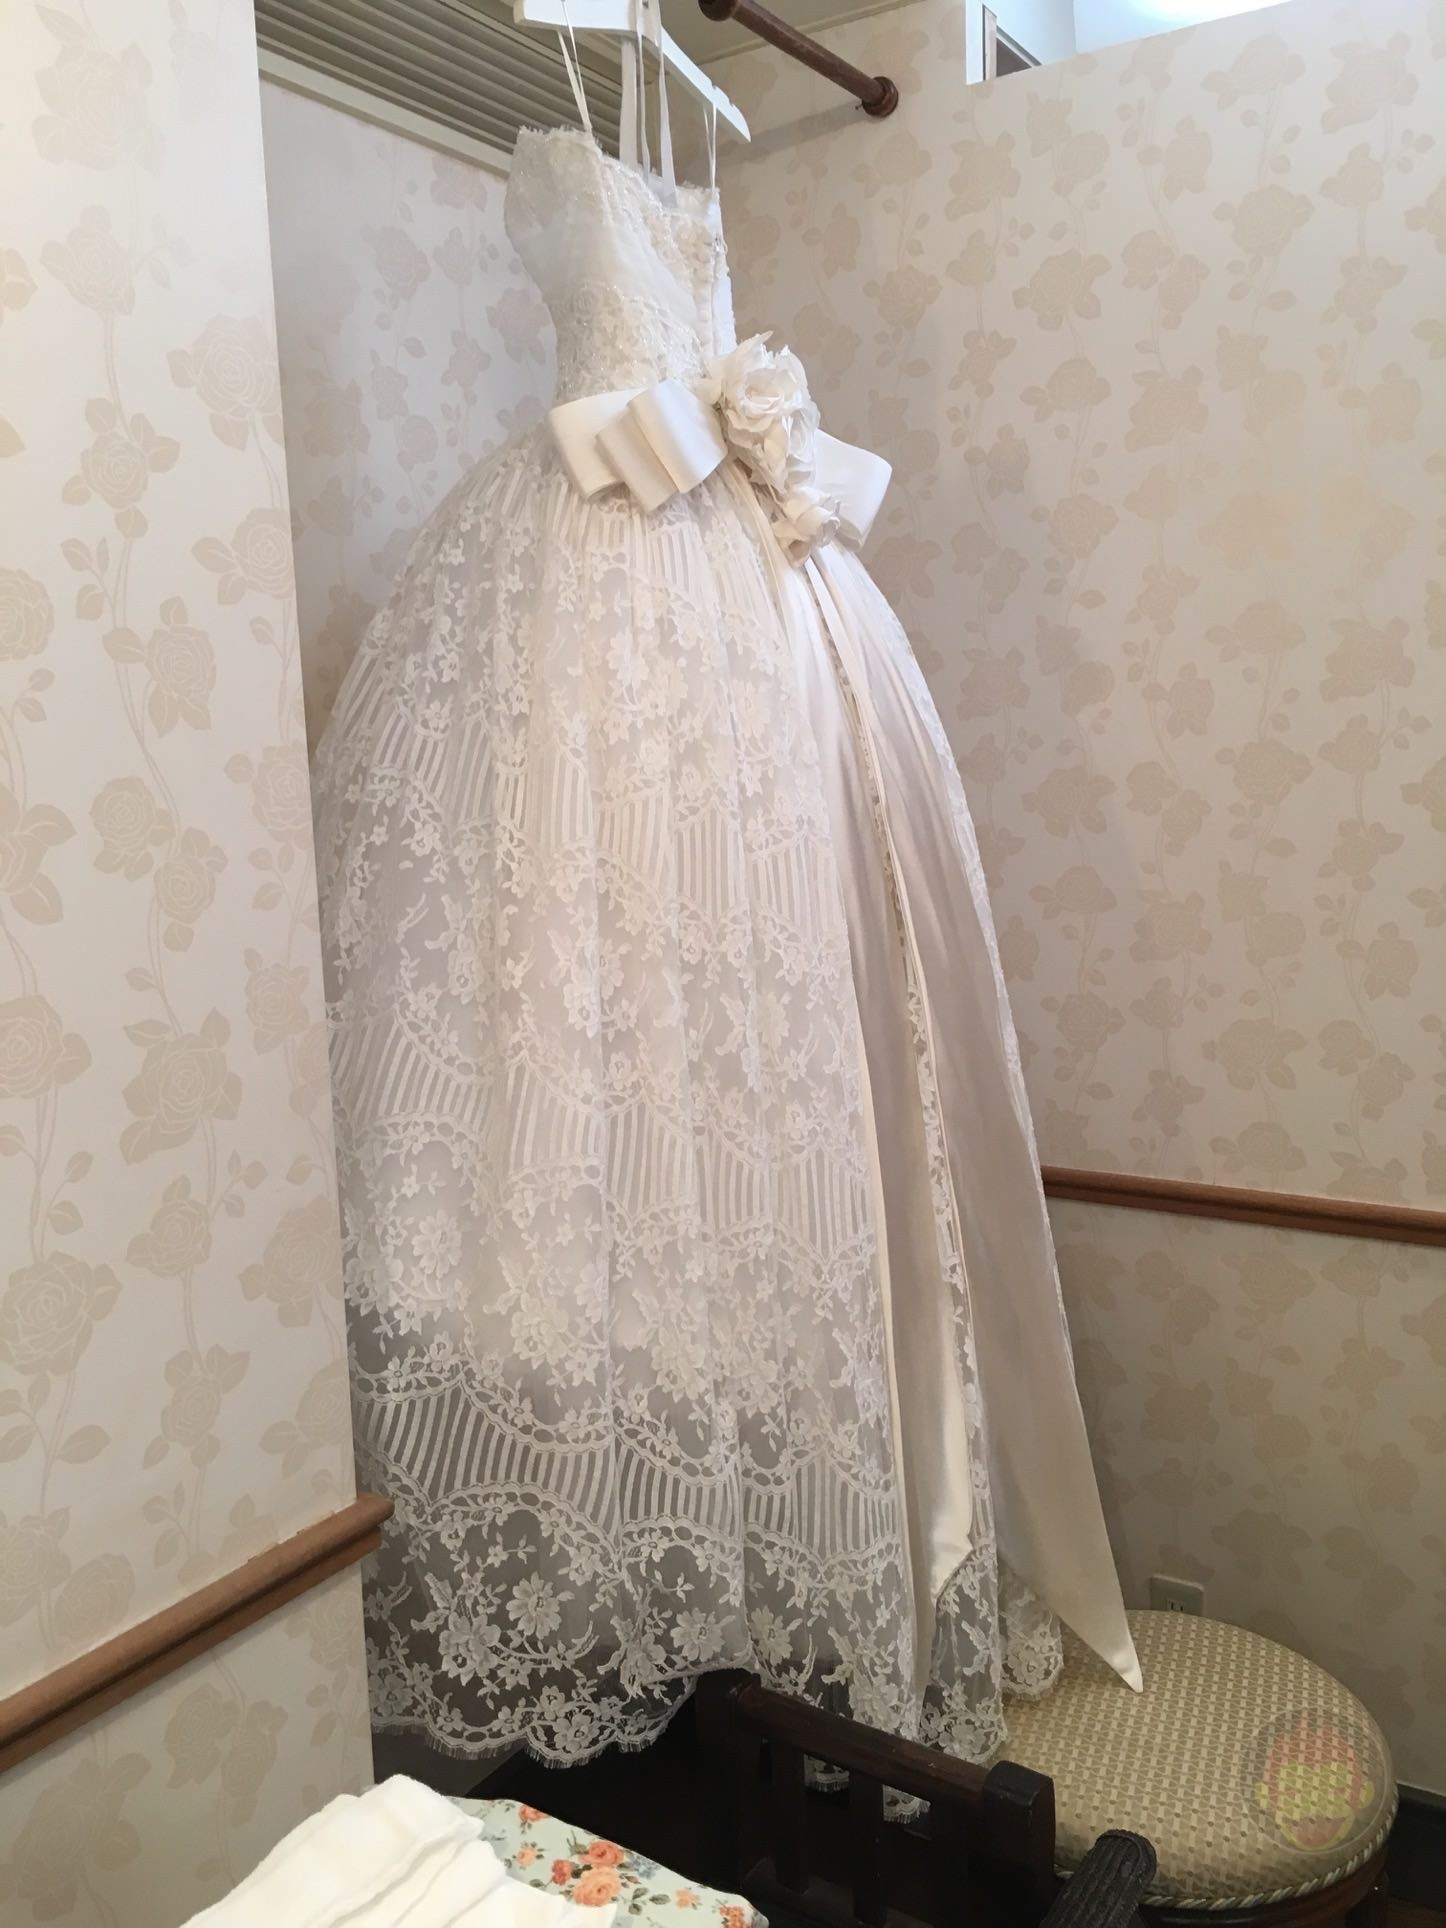 Brides Dress for goriwedding